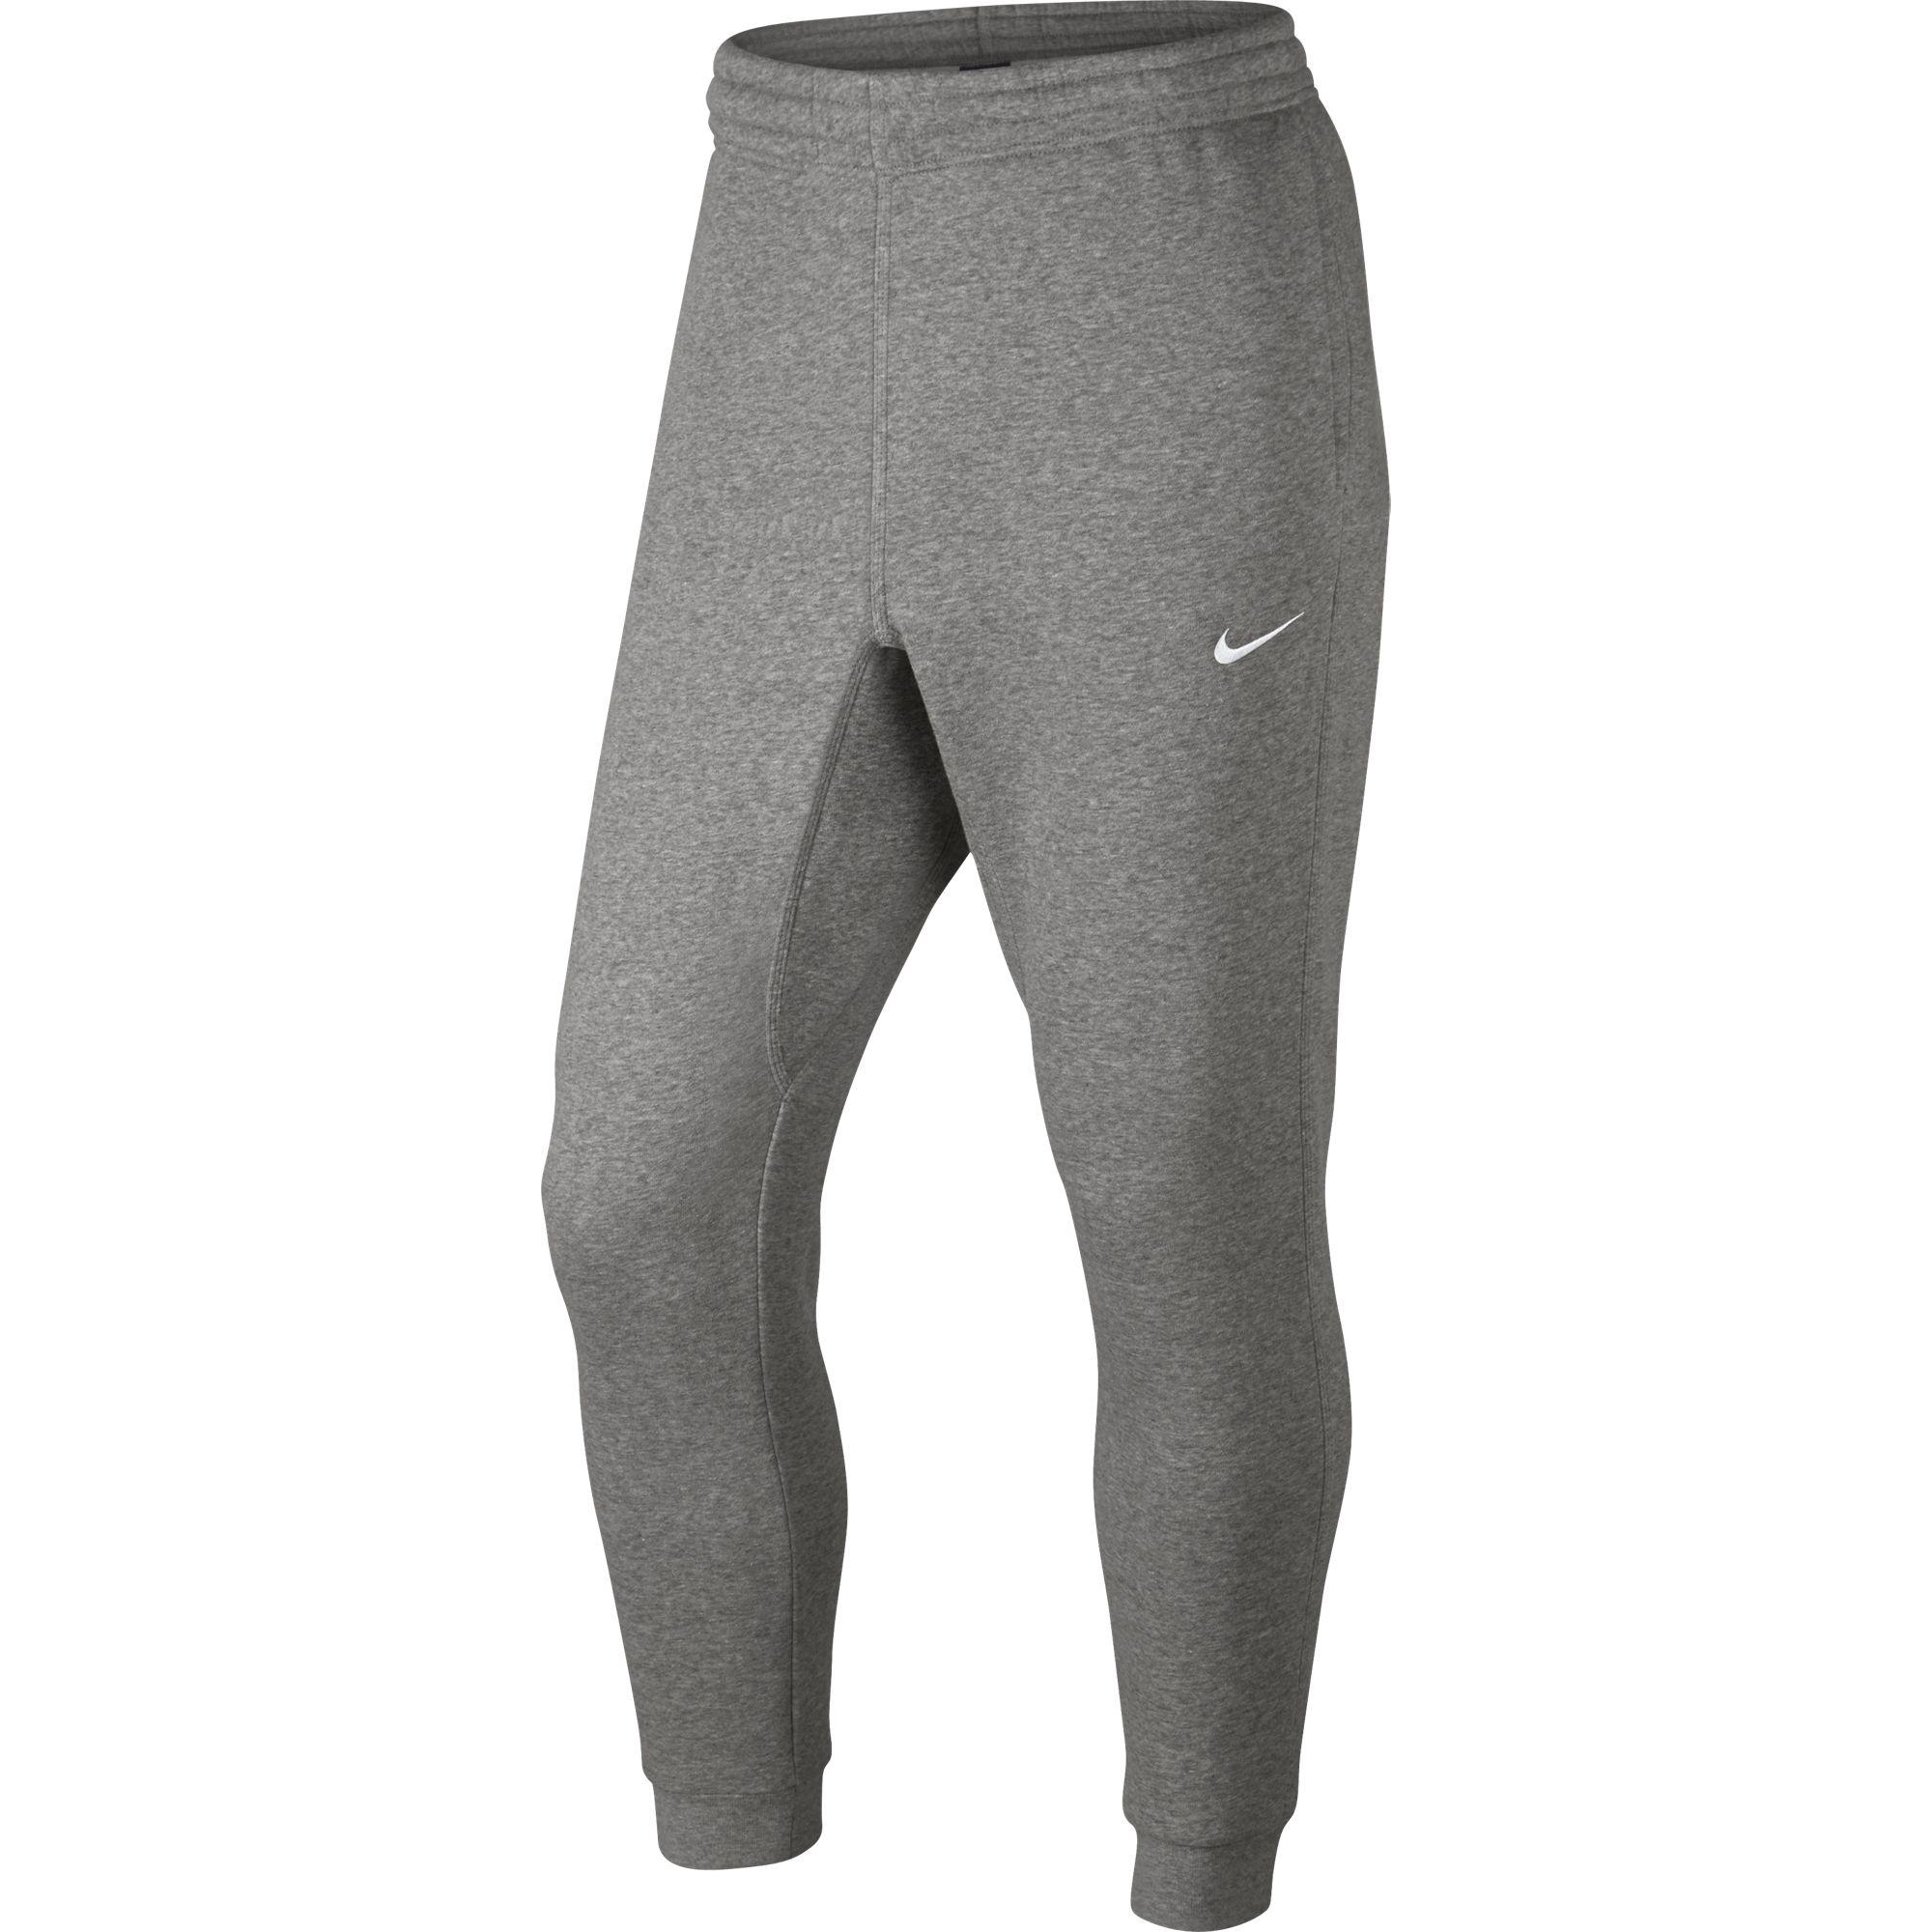 Nike Mens Club Fleece Tapered Pants - Dark Grey Heather